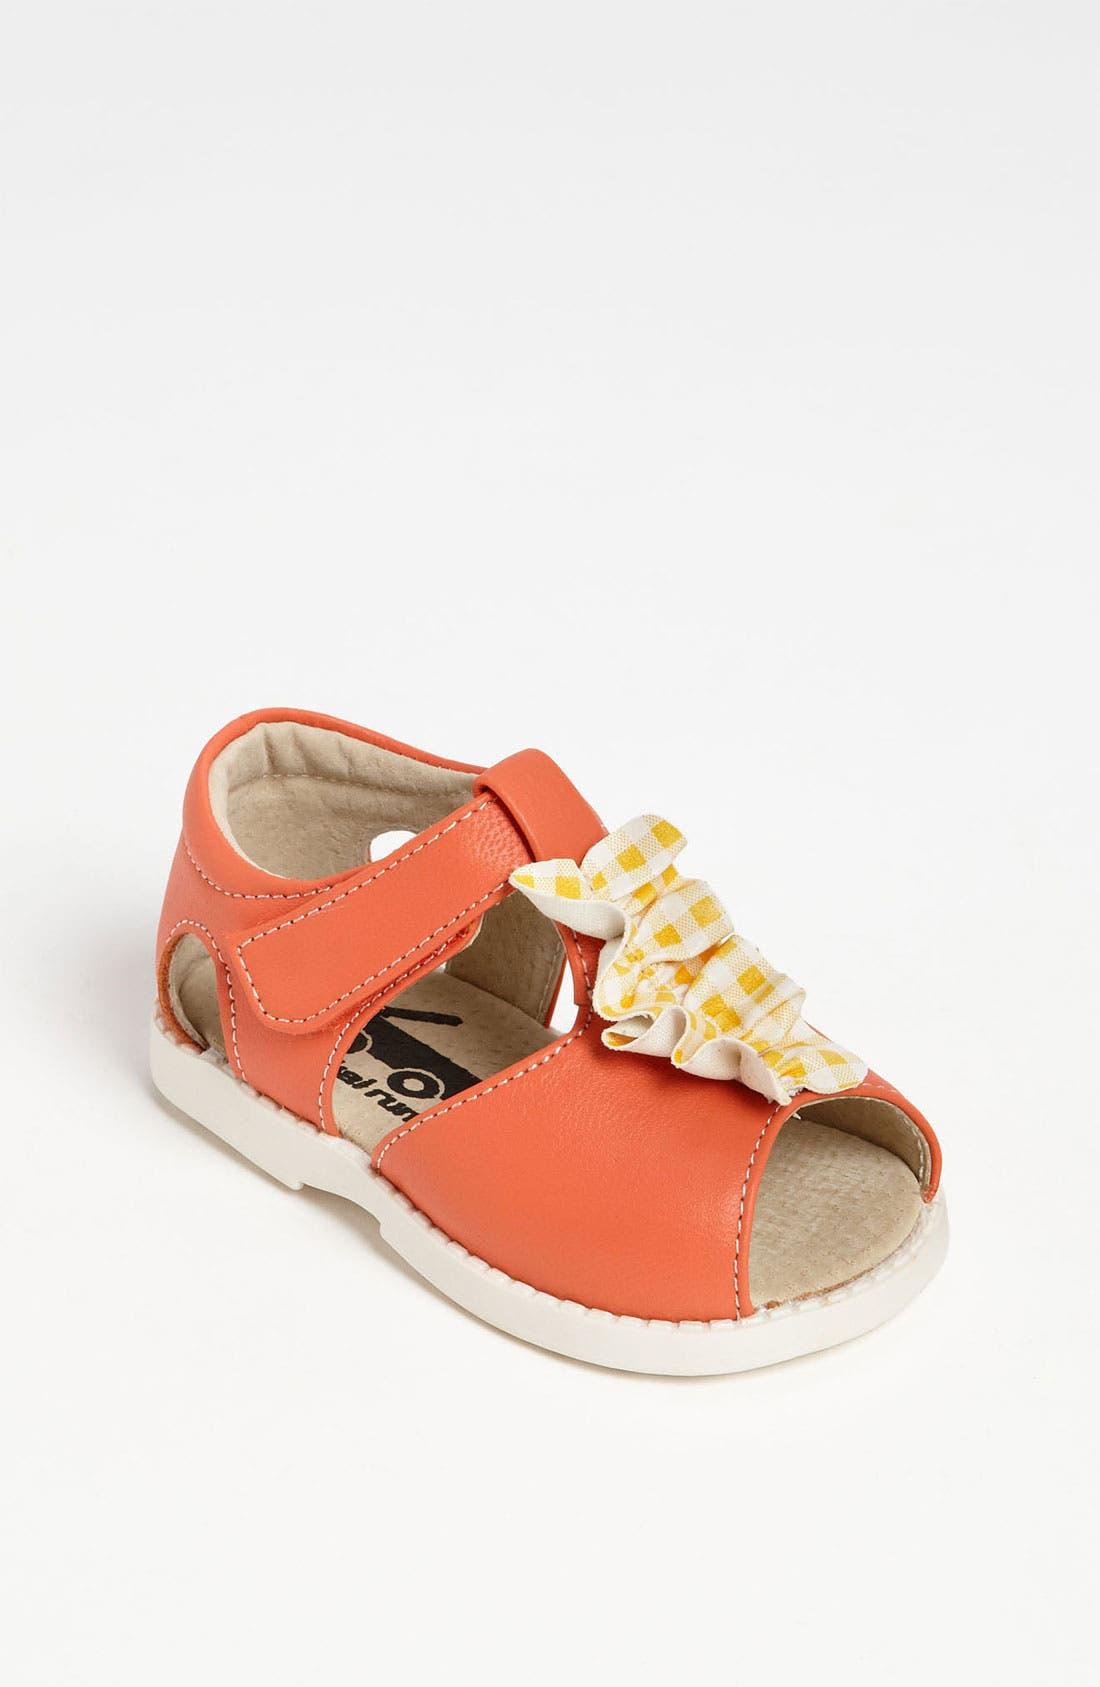 Alternate Image 1 Selected - See Kai Run 'Merrilee' Sandal (Baby, Walker & Toddler)